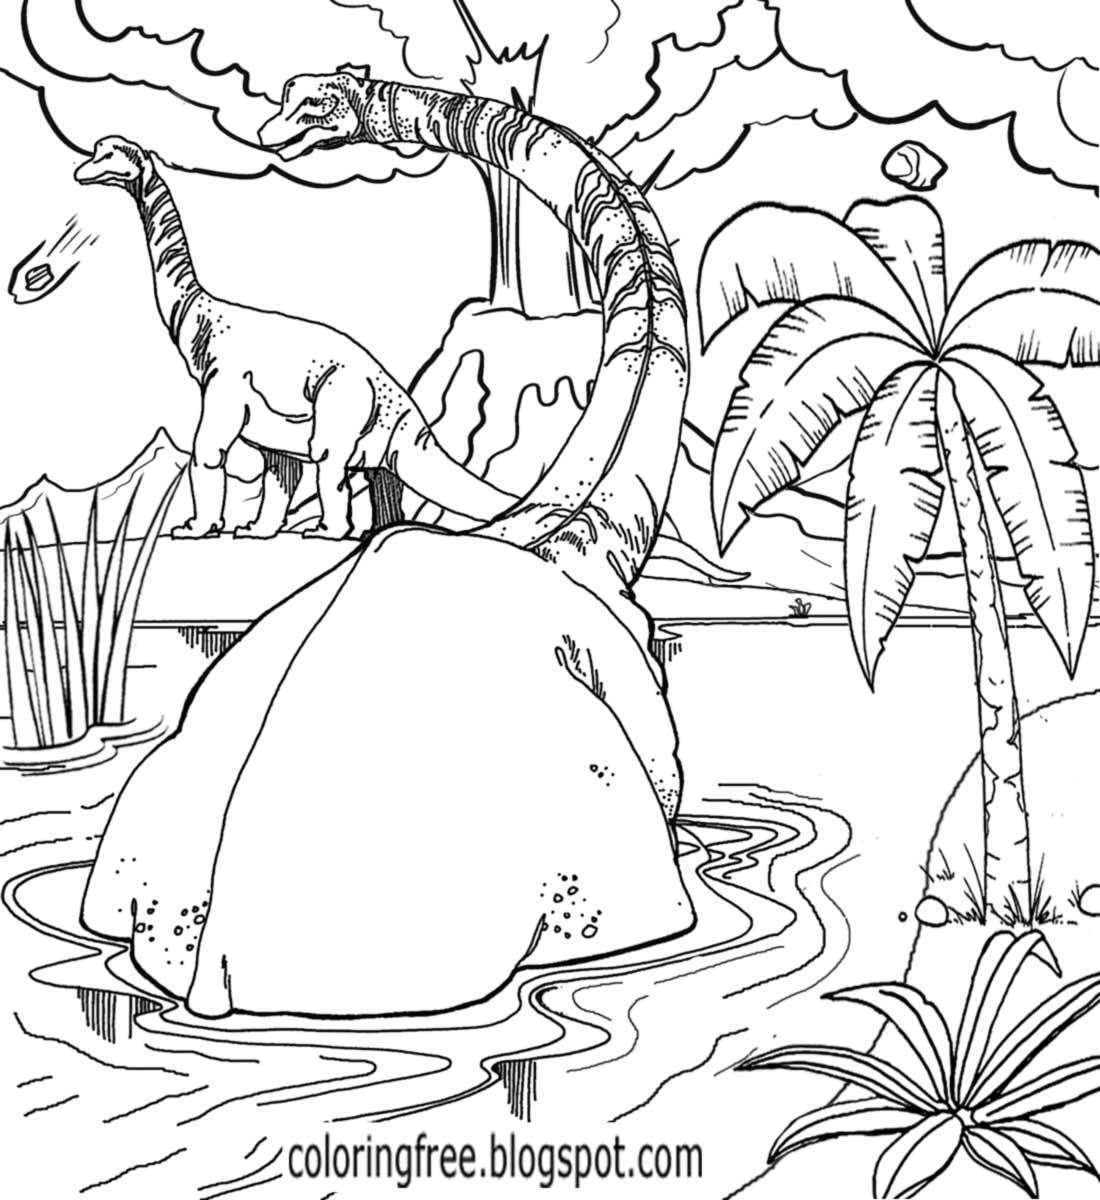 print dinosaur coloring pages colormecrazyorg dinosaur train coloring pages pages print dinosaur coloring